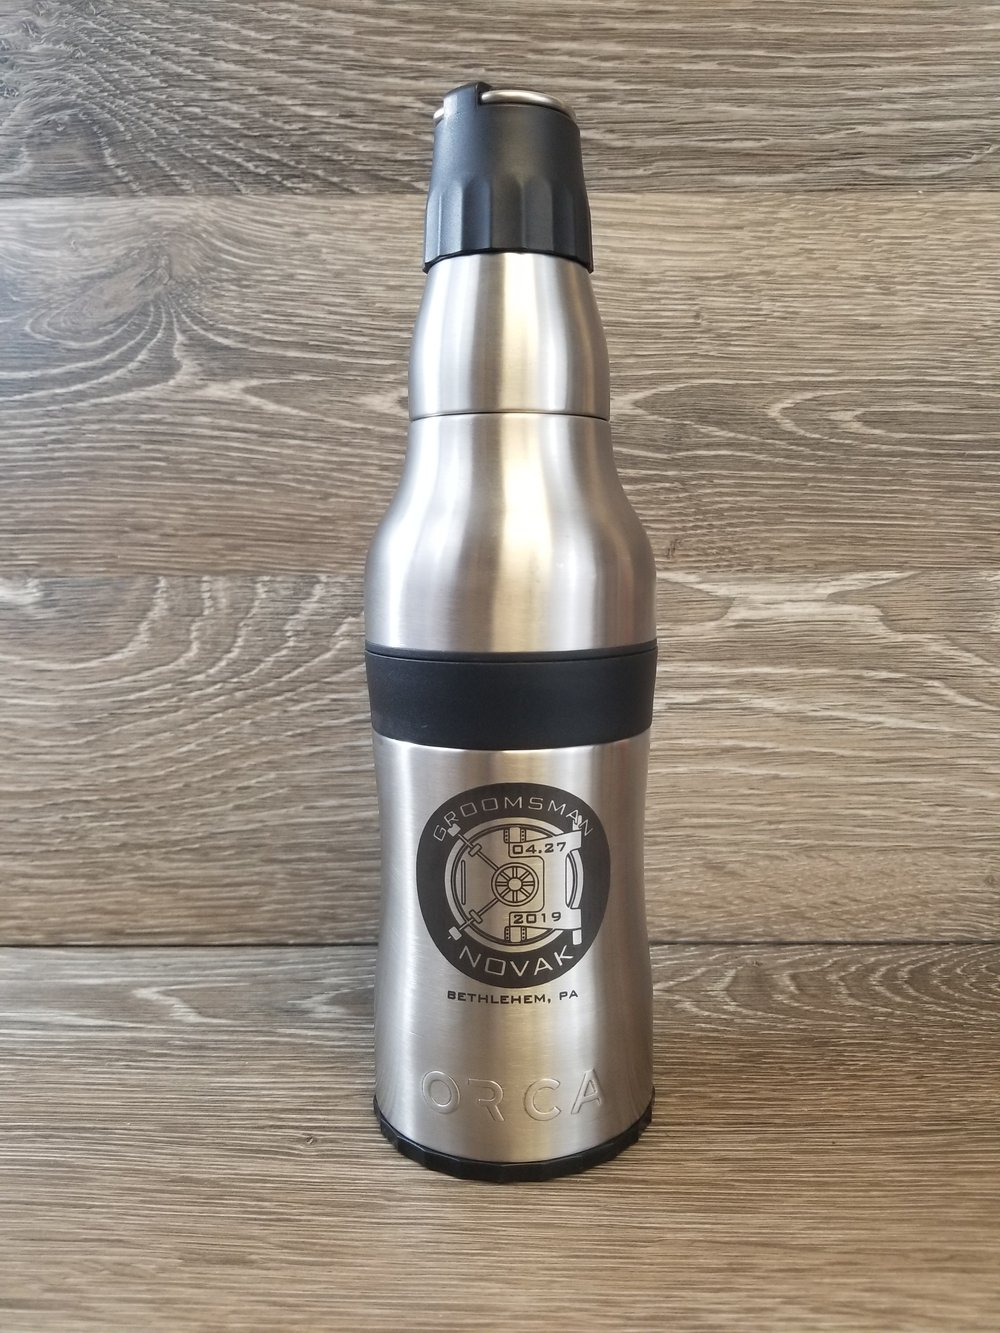 Engraved Bottle Koozie - Custom Bootle Koozie - Personalized Bottle Koozie - Engraved Stainless Steel Bottle Koozie - Personalized Insulated Bottle Koozie - Engrave It Houston